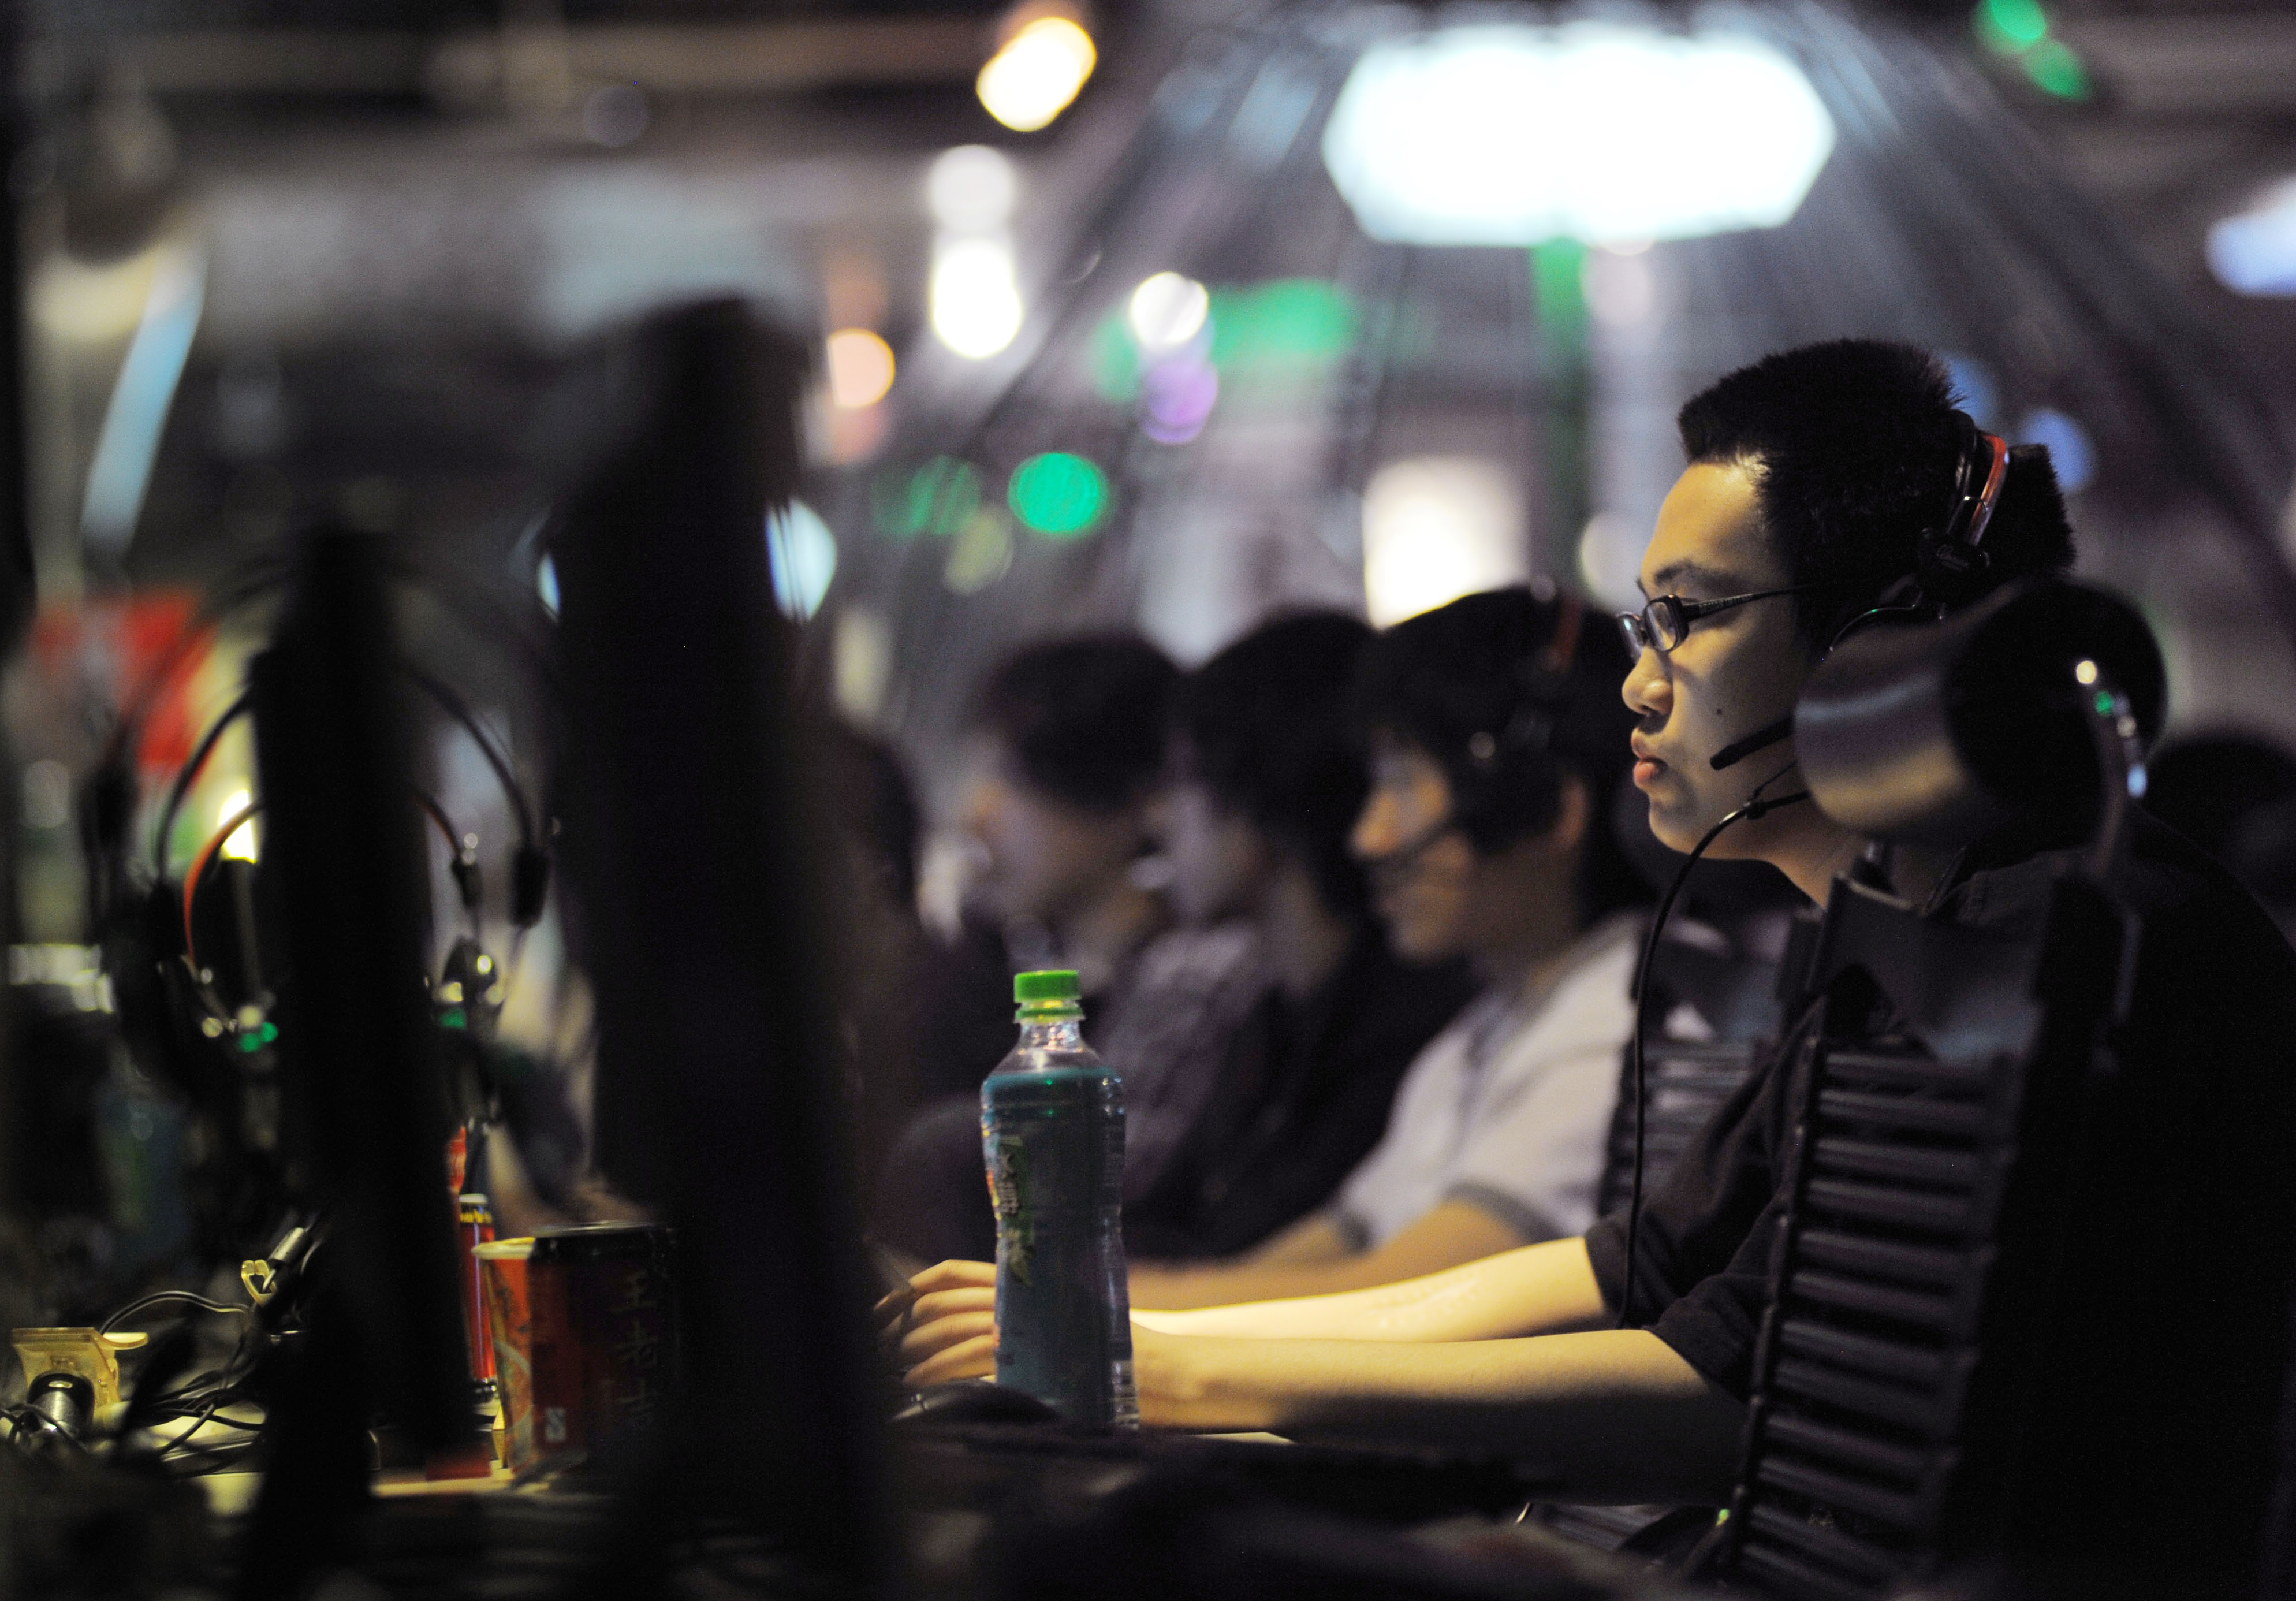 China's Main Anti-American Writer Just Got a Promotion